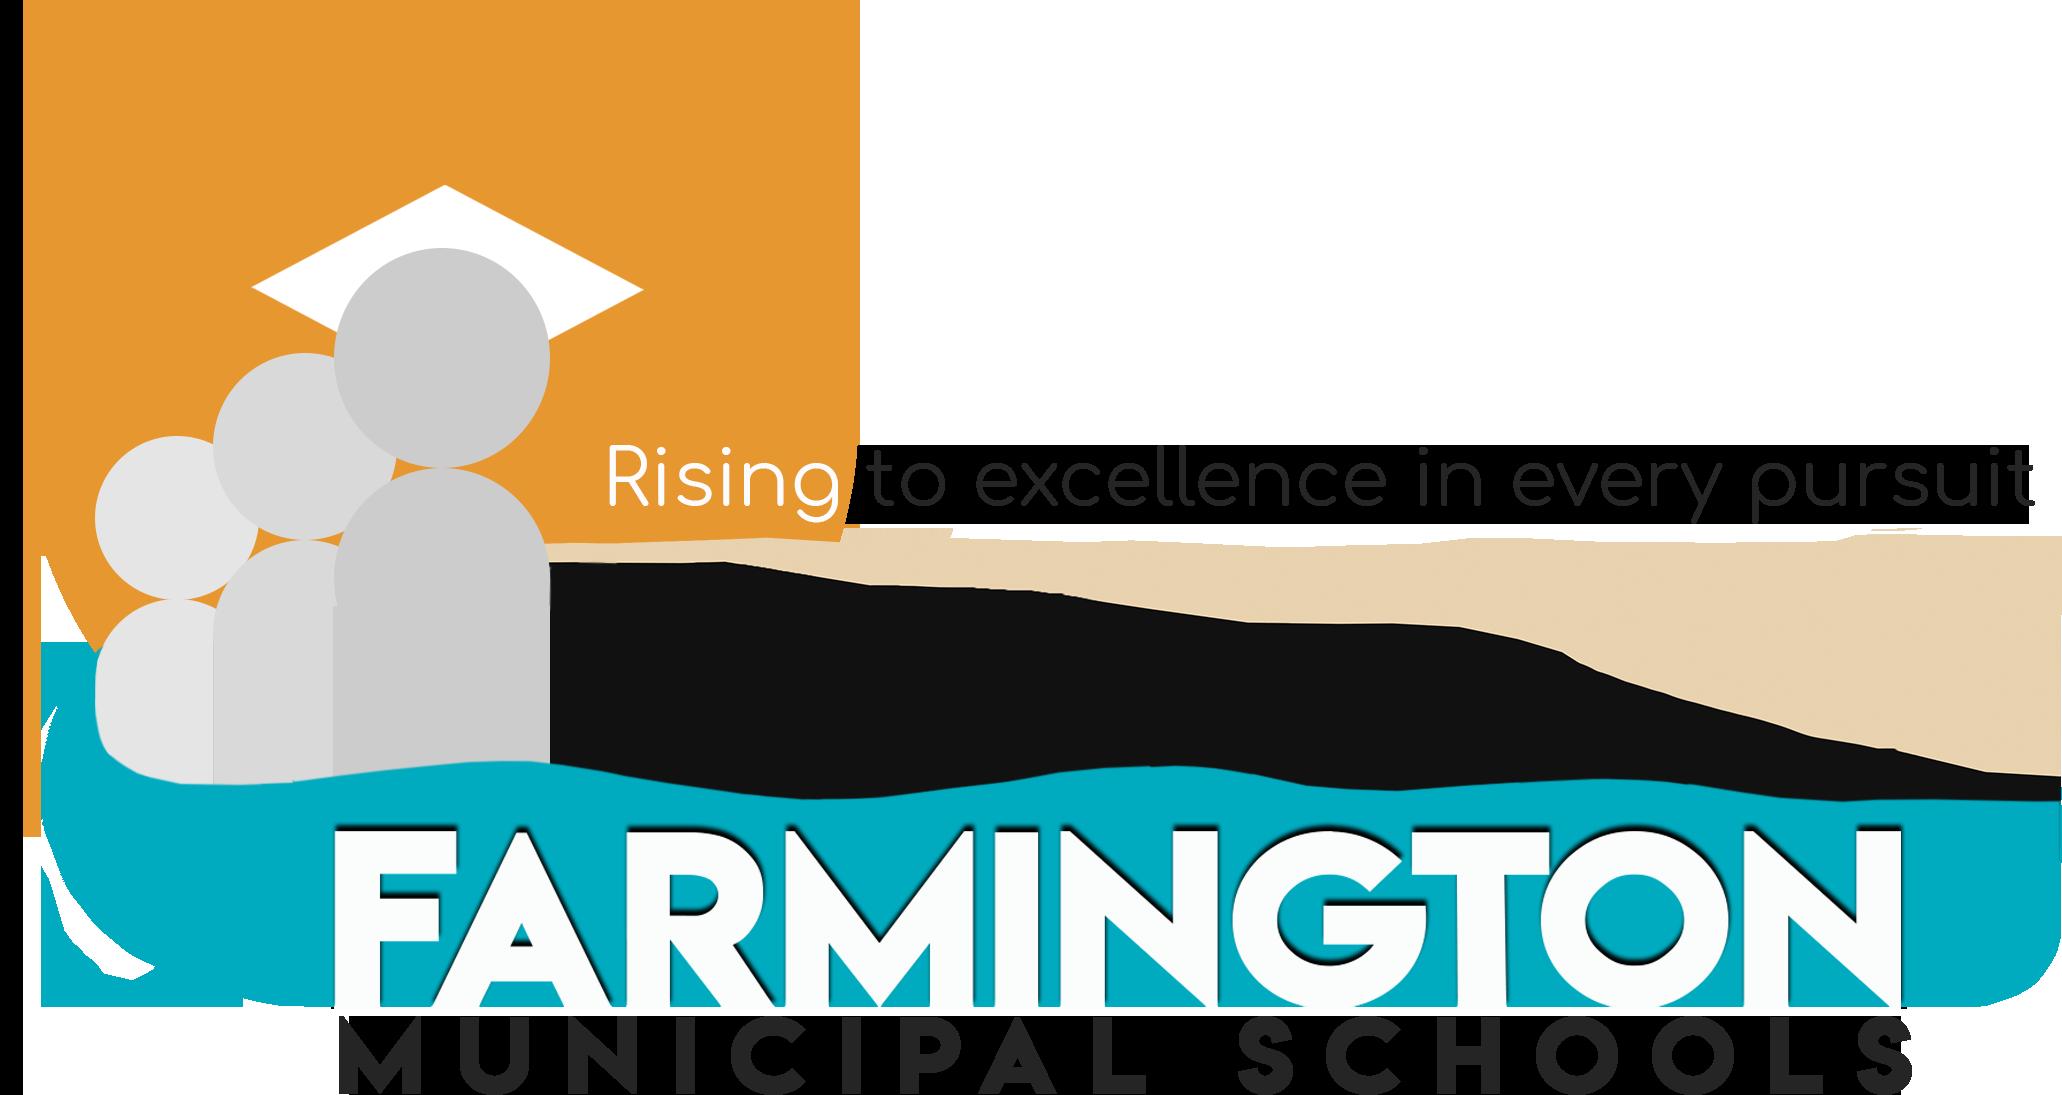 Farmington municipal schools improves all aspects of transportation